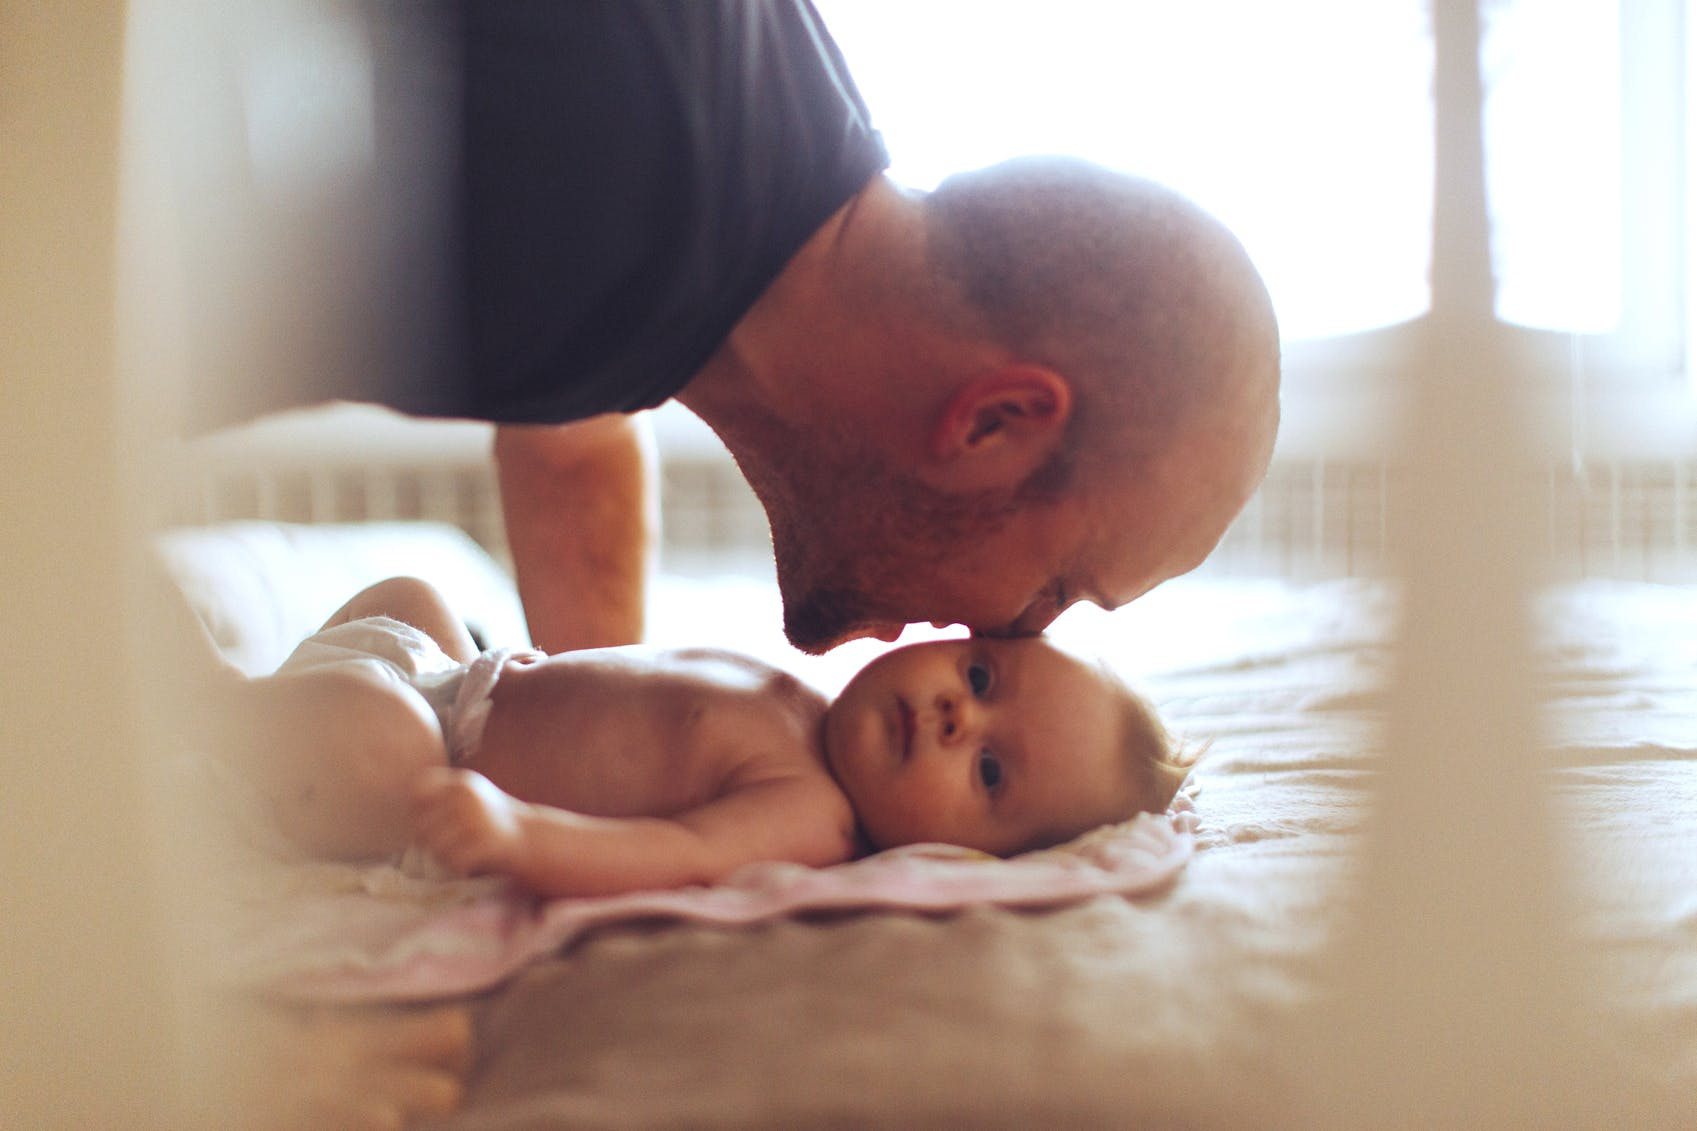 Le test de paternité et le test de paternité  prénatal